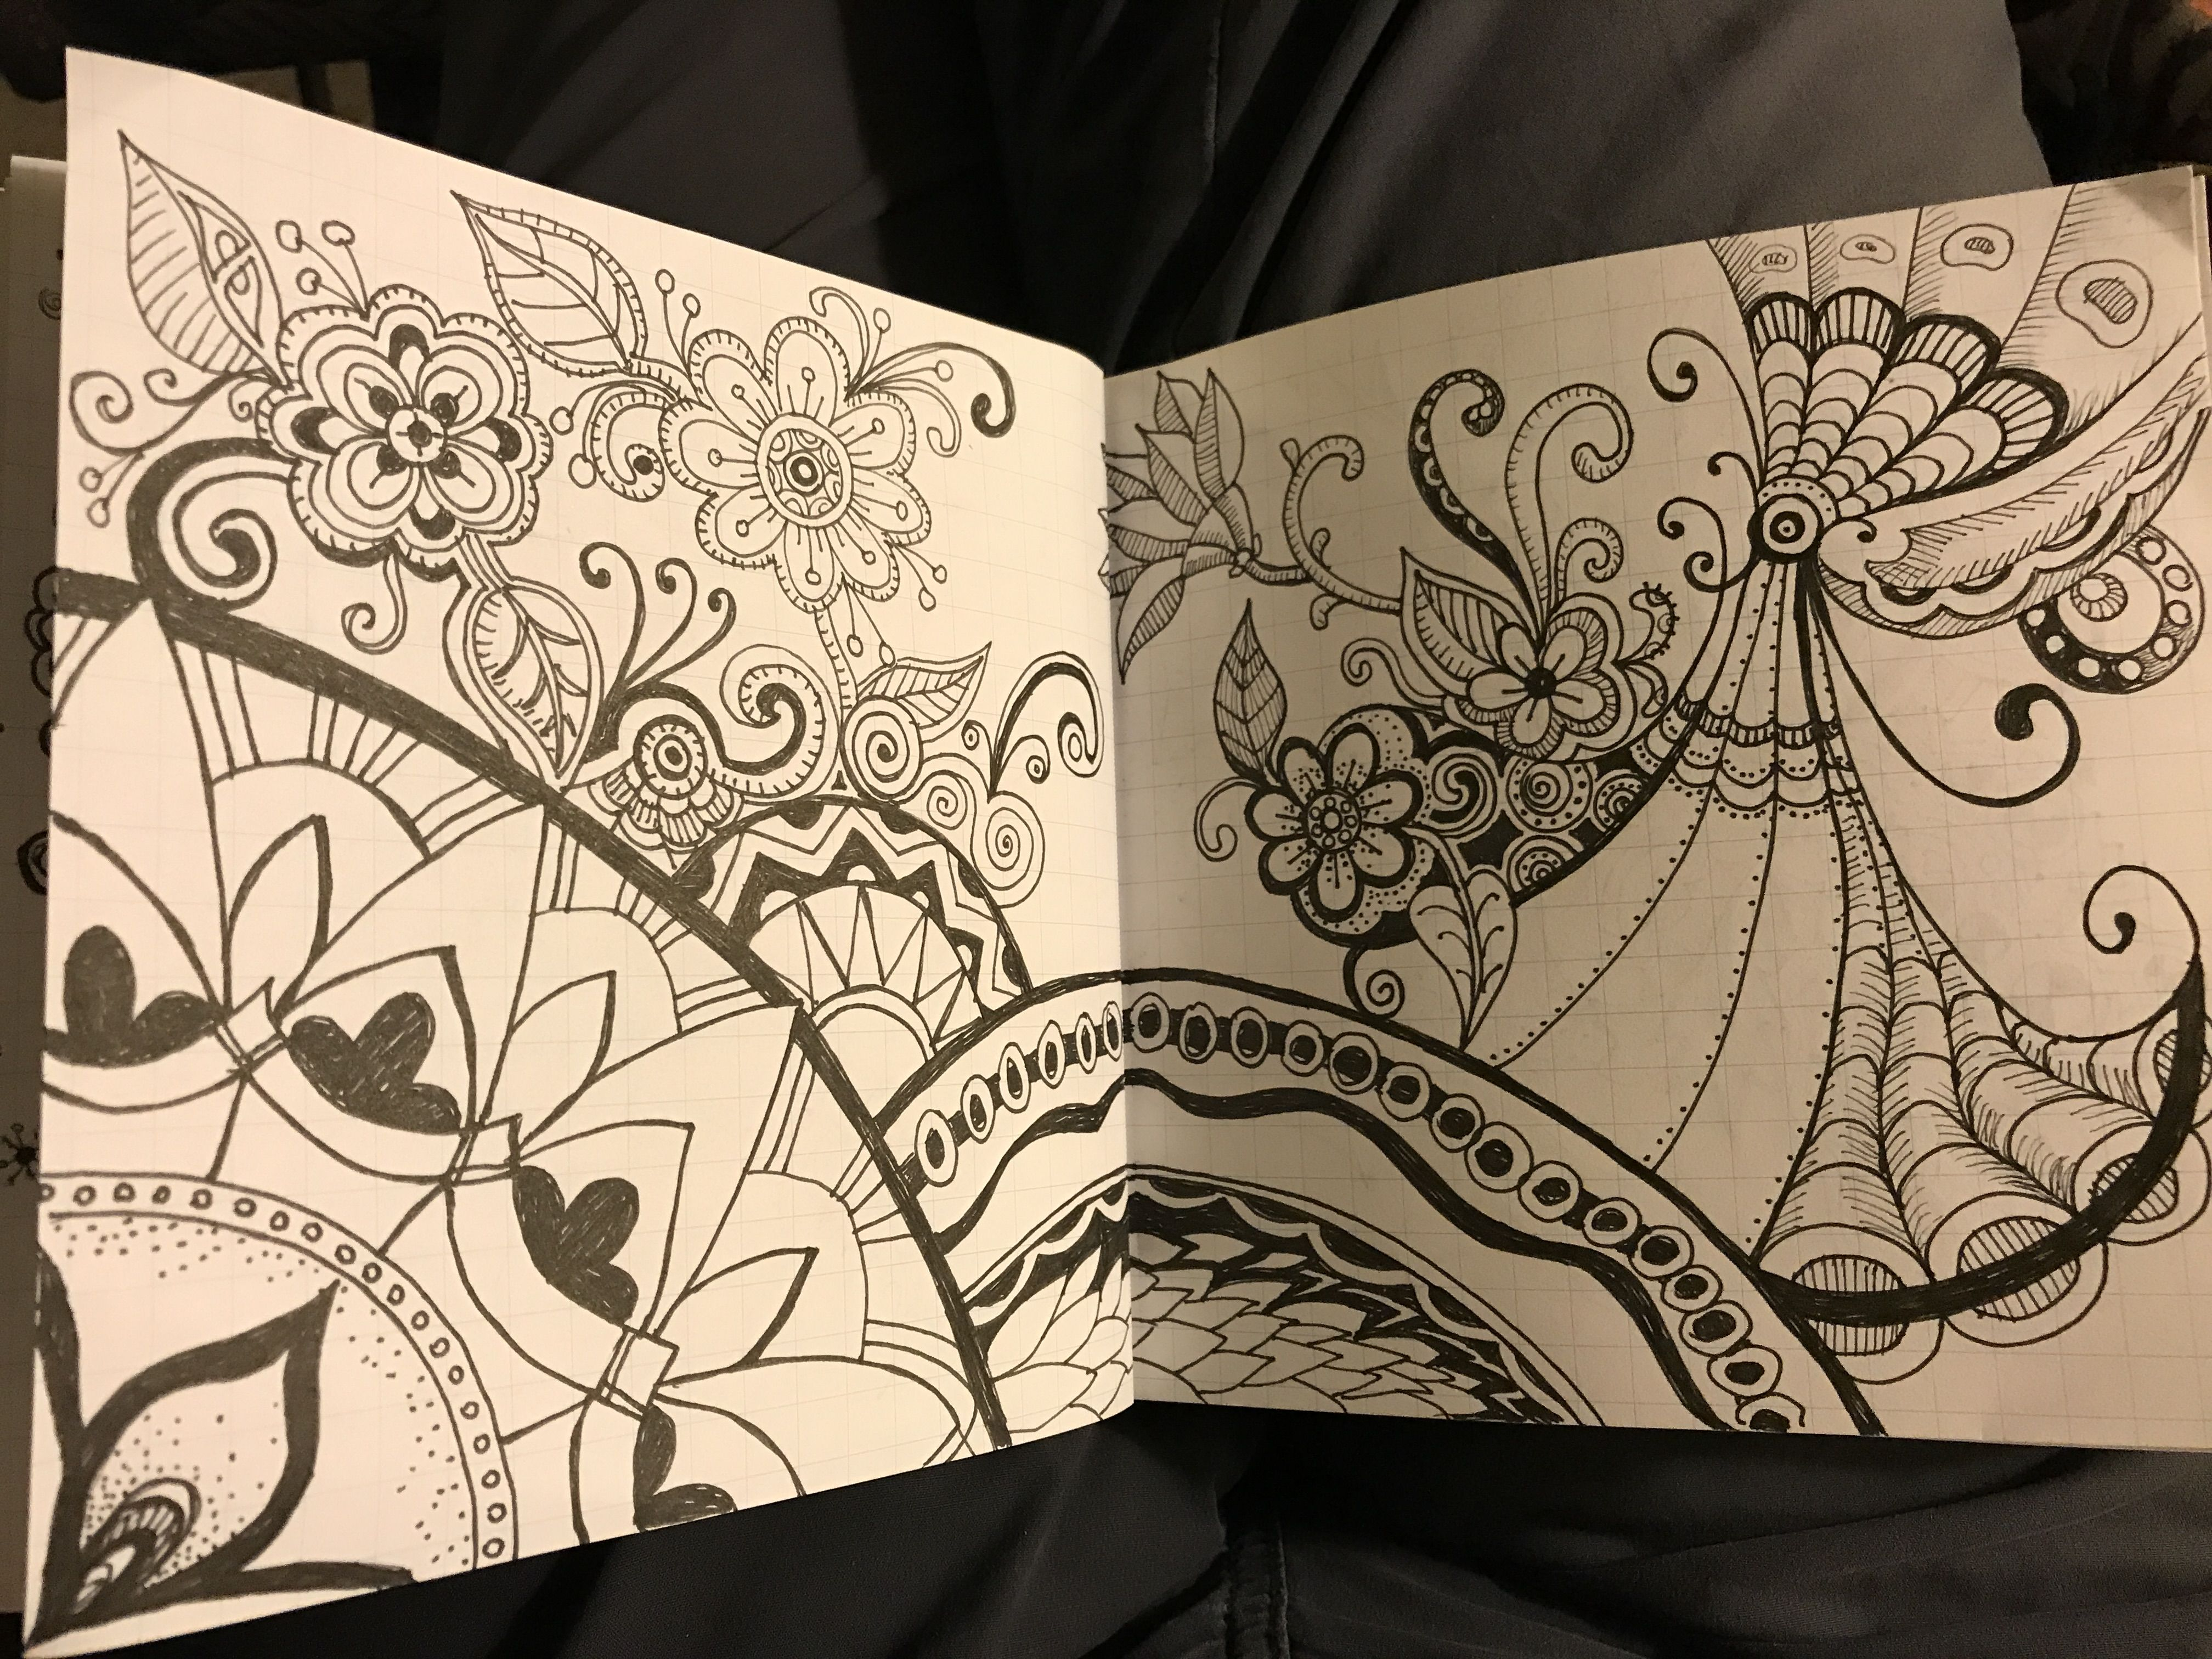 Pin de Kathleen Maturin en zentangle | Pinterest | Dibujo